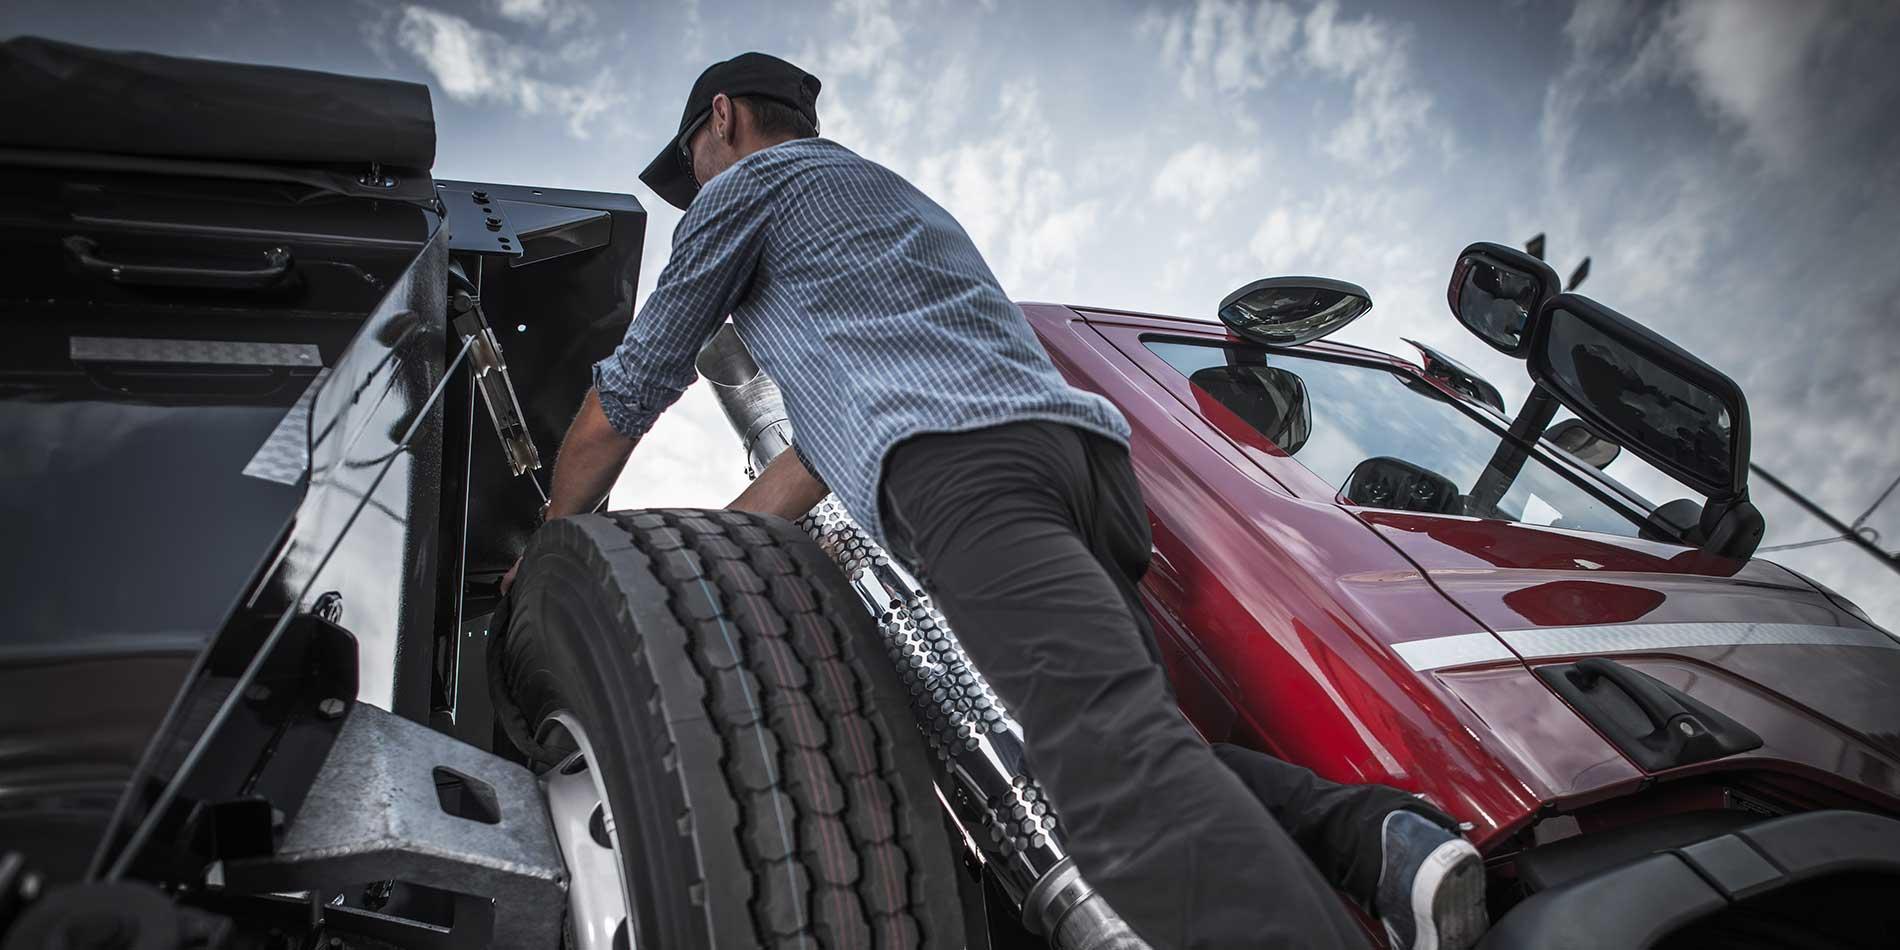 7 Ways to Avoid Common Maintenance Problems